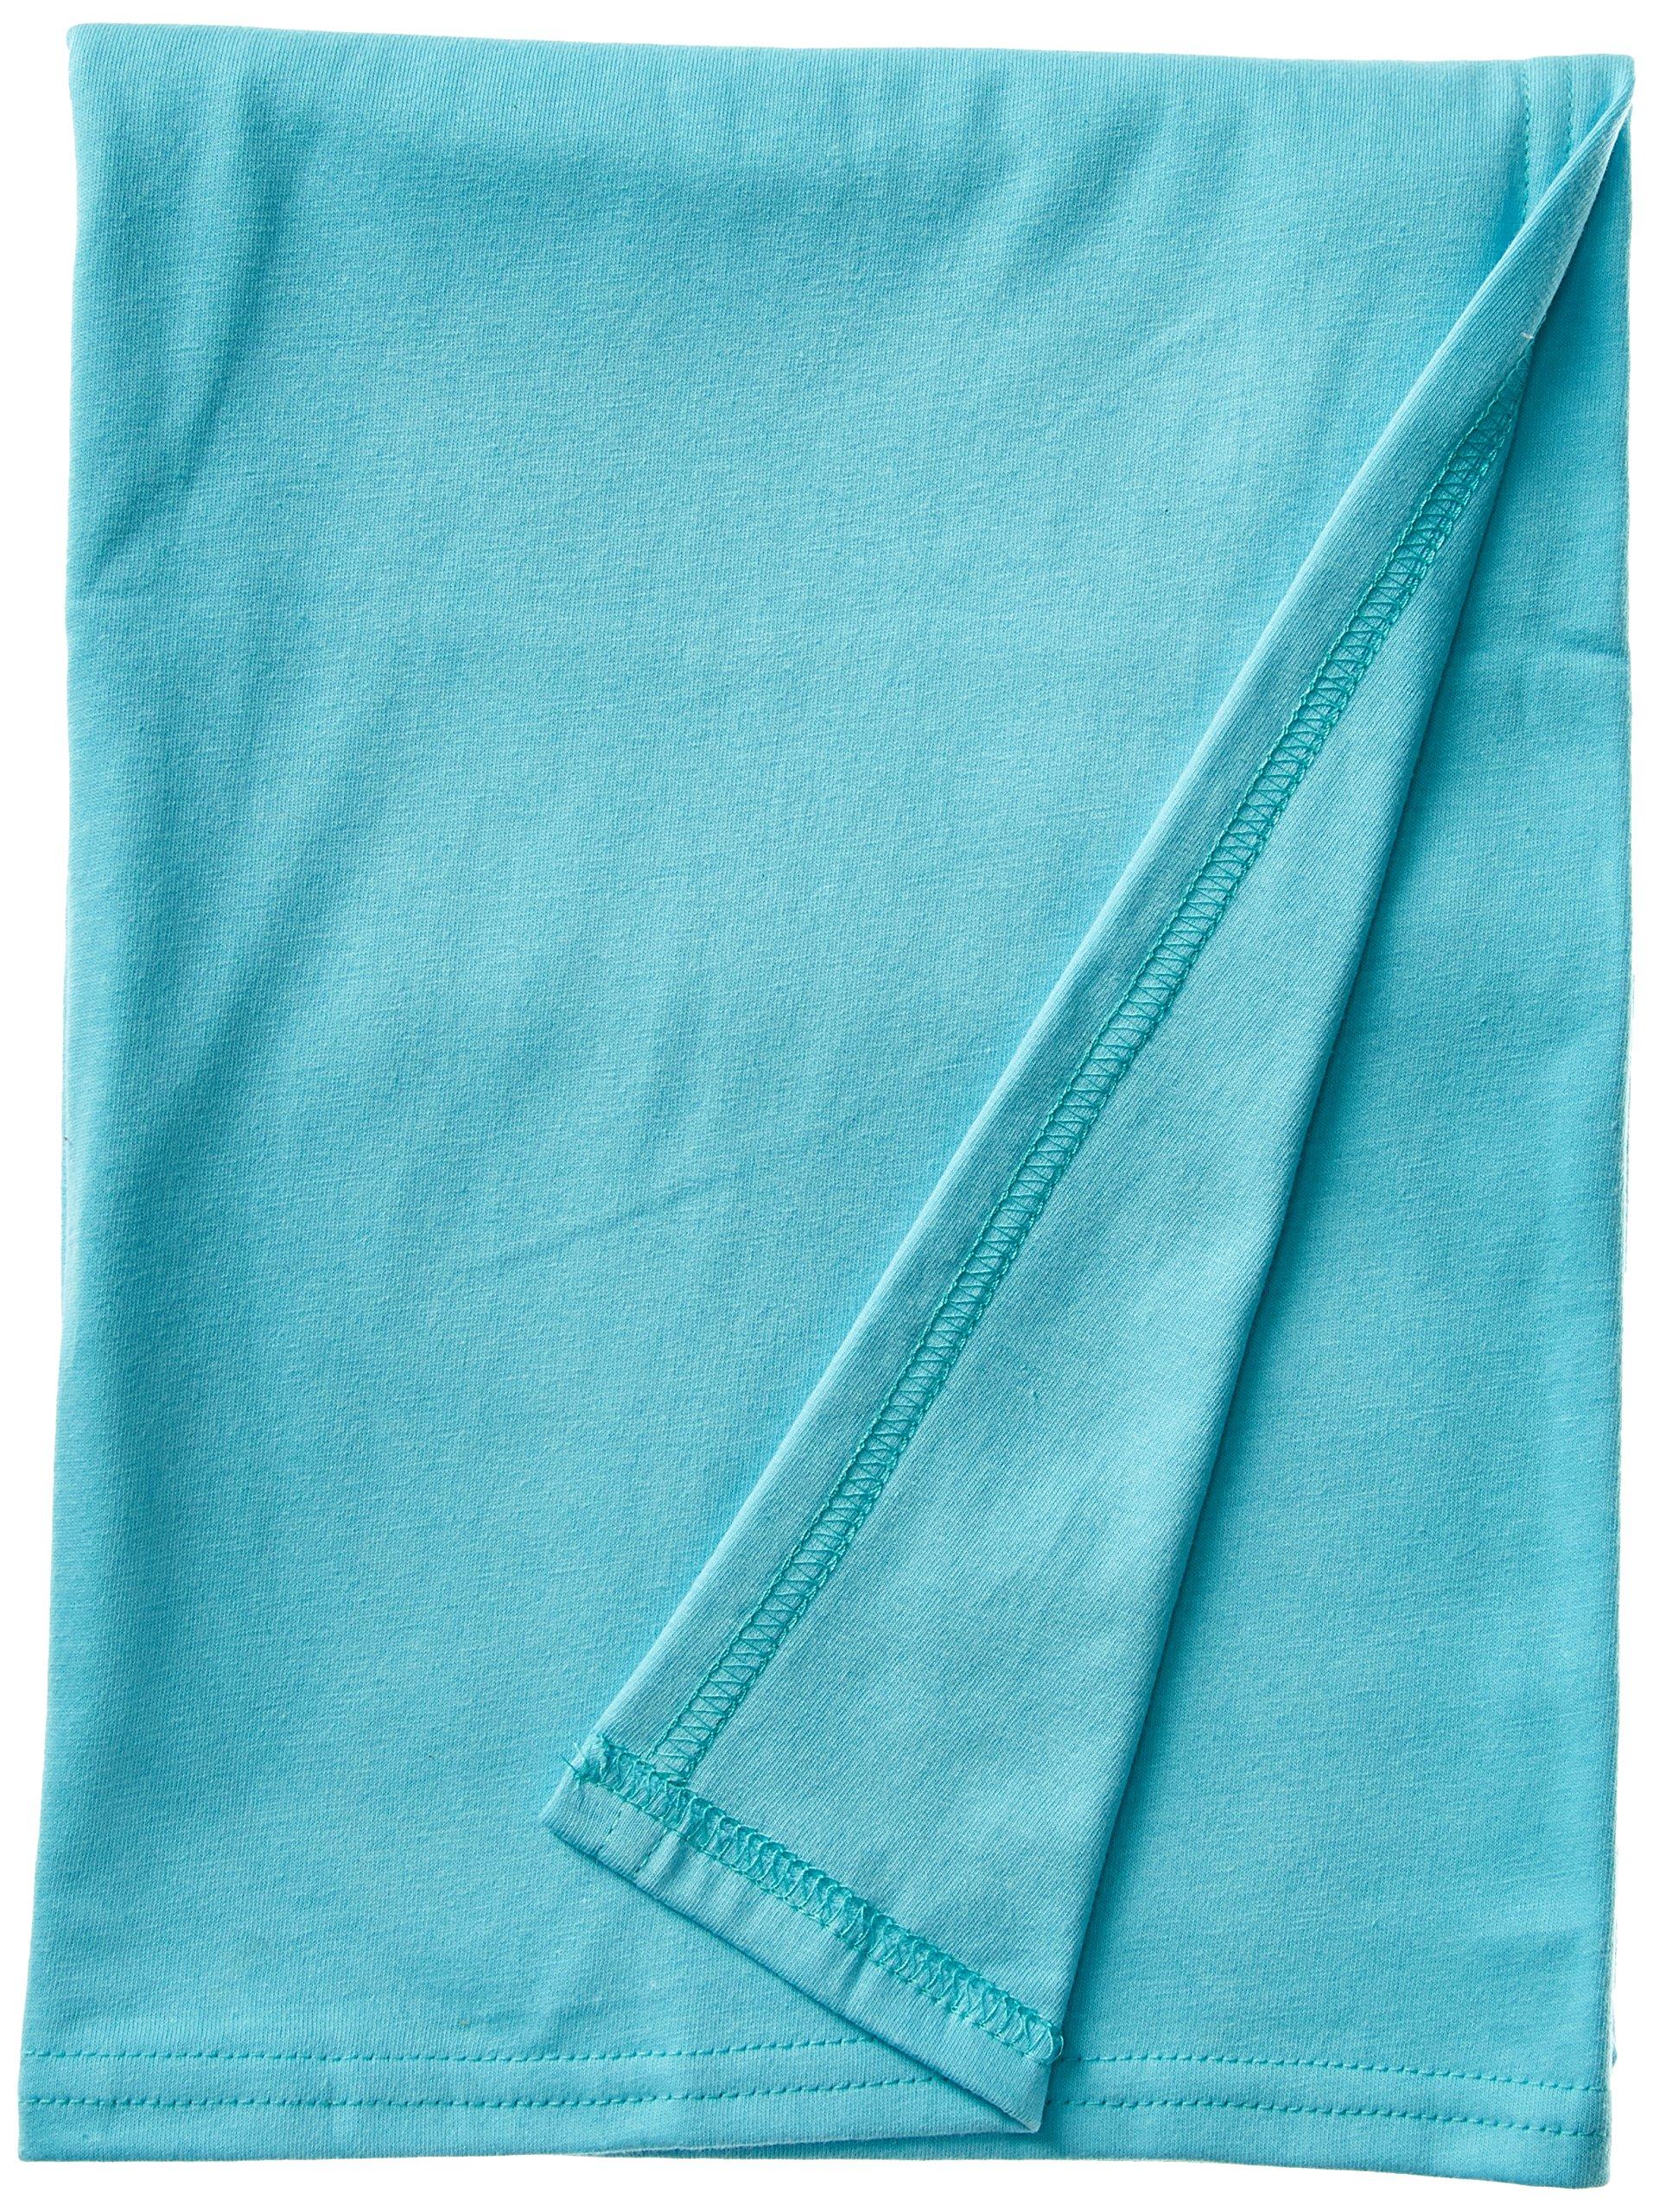 SheetWorld Soft & Stretchy Swaddle Blanket - Aqua - Made In USA